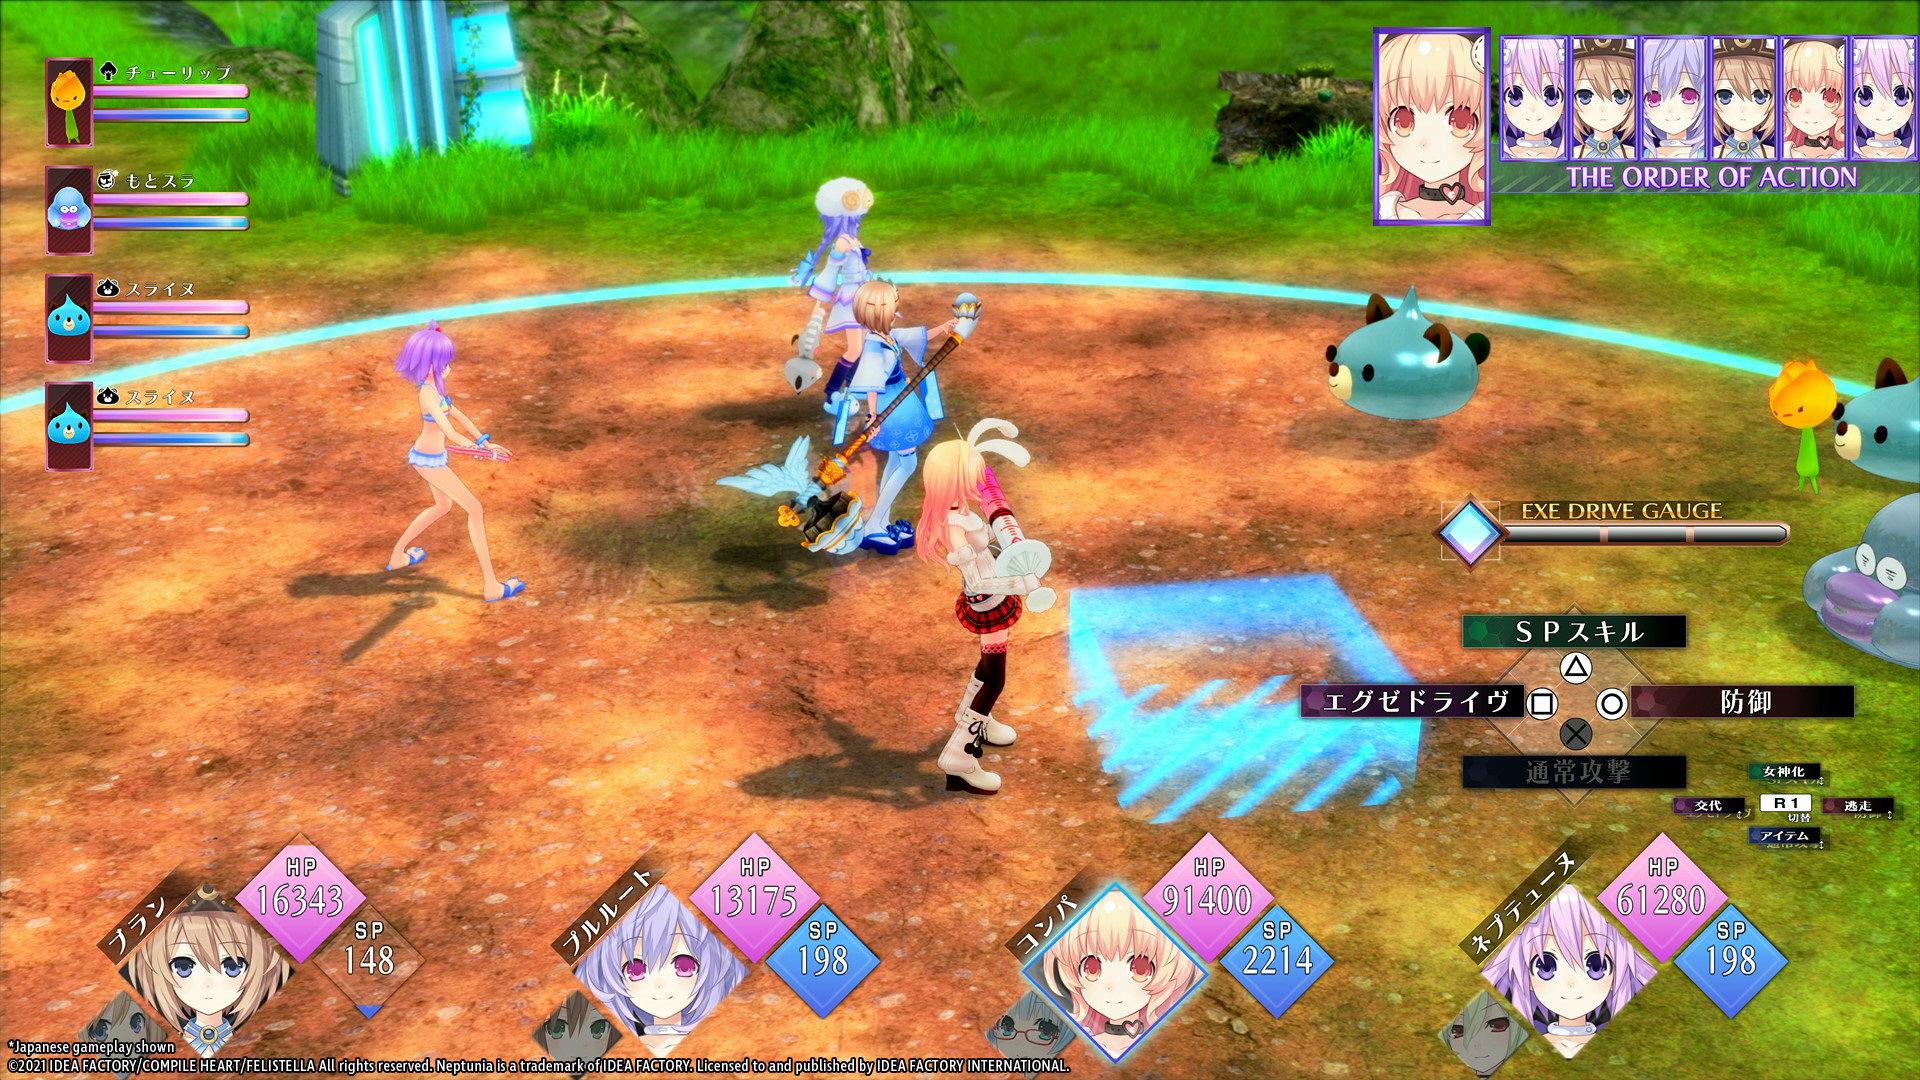 Neptunia Reverse Screenshot of combat